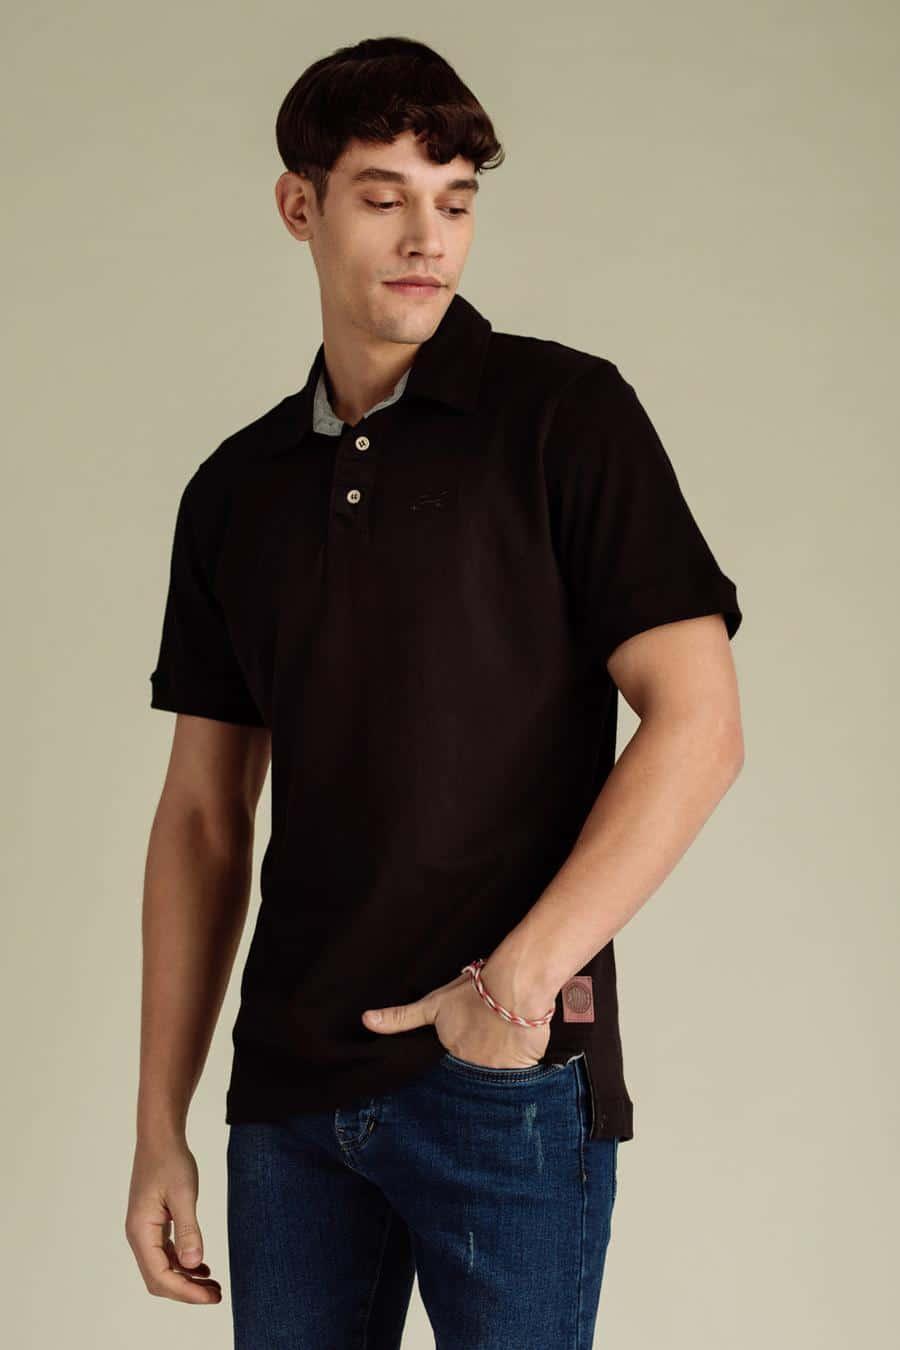 jagger muska majica kolekcija prolece leto 2021 ss 2021 kupi online jm 3014 01 1